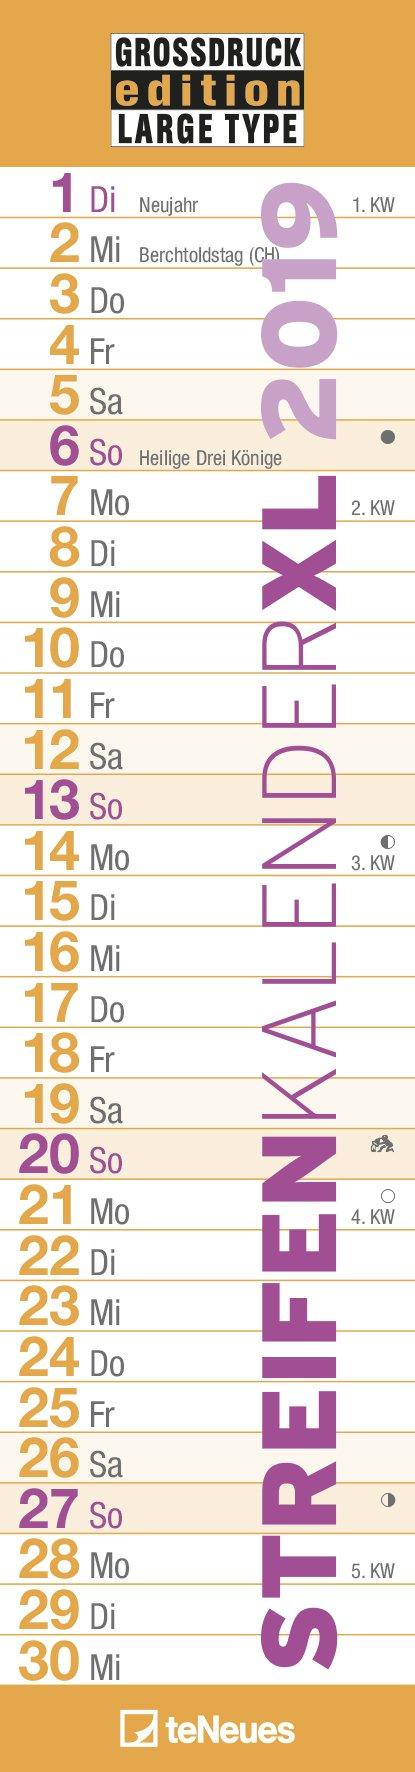 Grossdruck 2019 - Streifenkalender, Notizkalender, Spiralbindung  -  15 x 64 cm